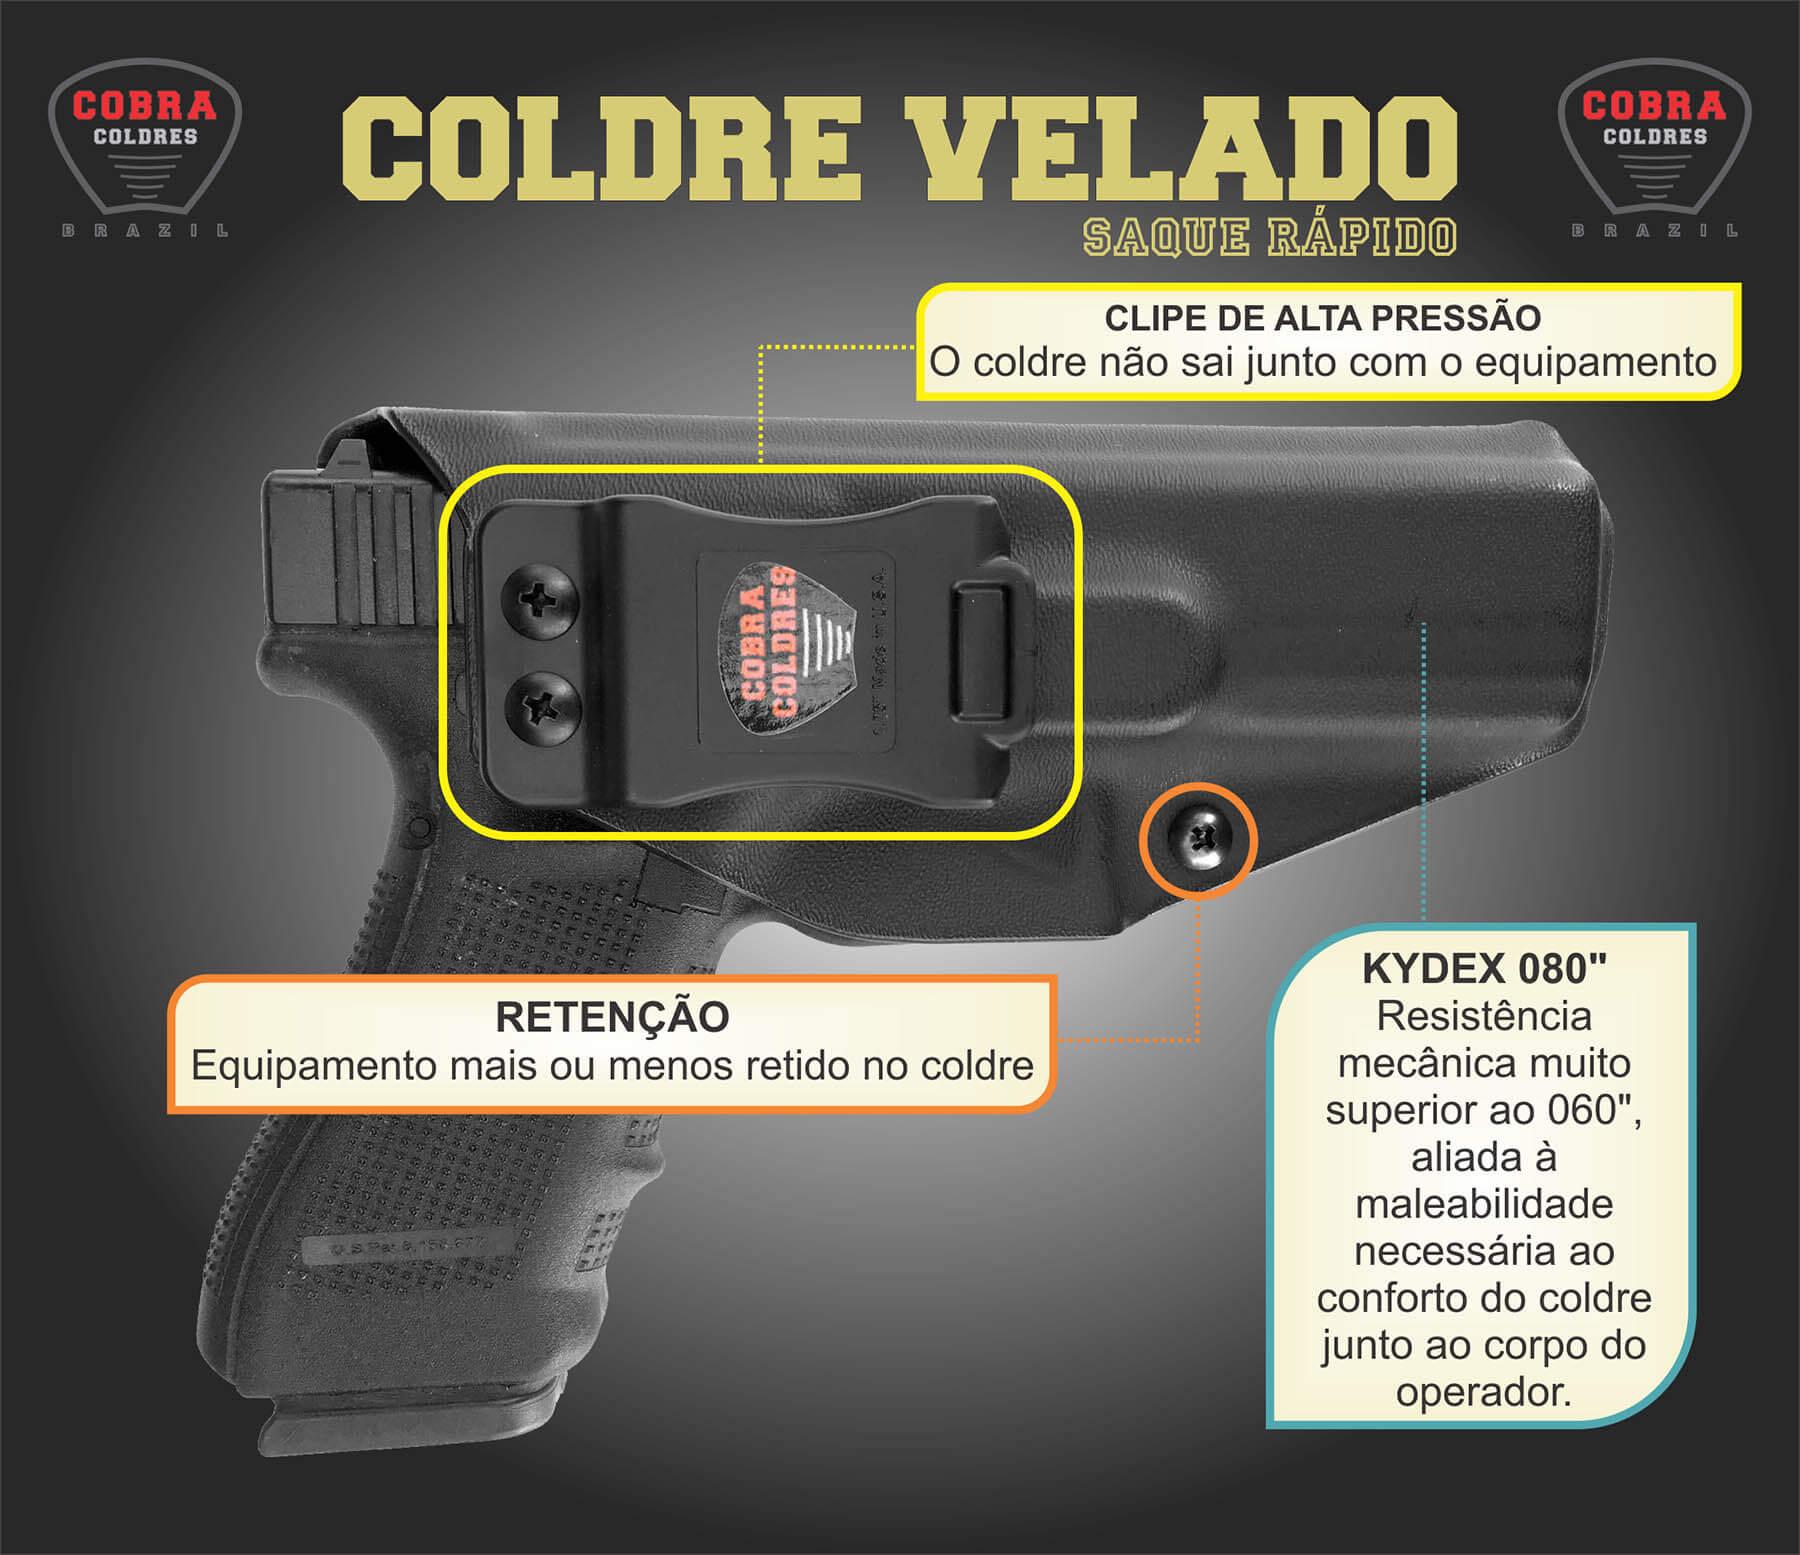 Coldre Kydex Premium [G2c] [G17] [G19] [G25] [TS9] [TH] [THc] [G21] [RT85] [RT817] [RT605] - Glock Taurus - Saque Rápido Velado Kydex® 080